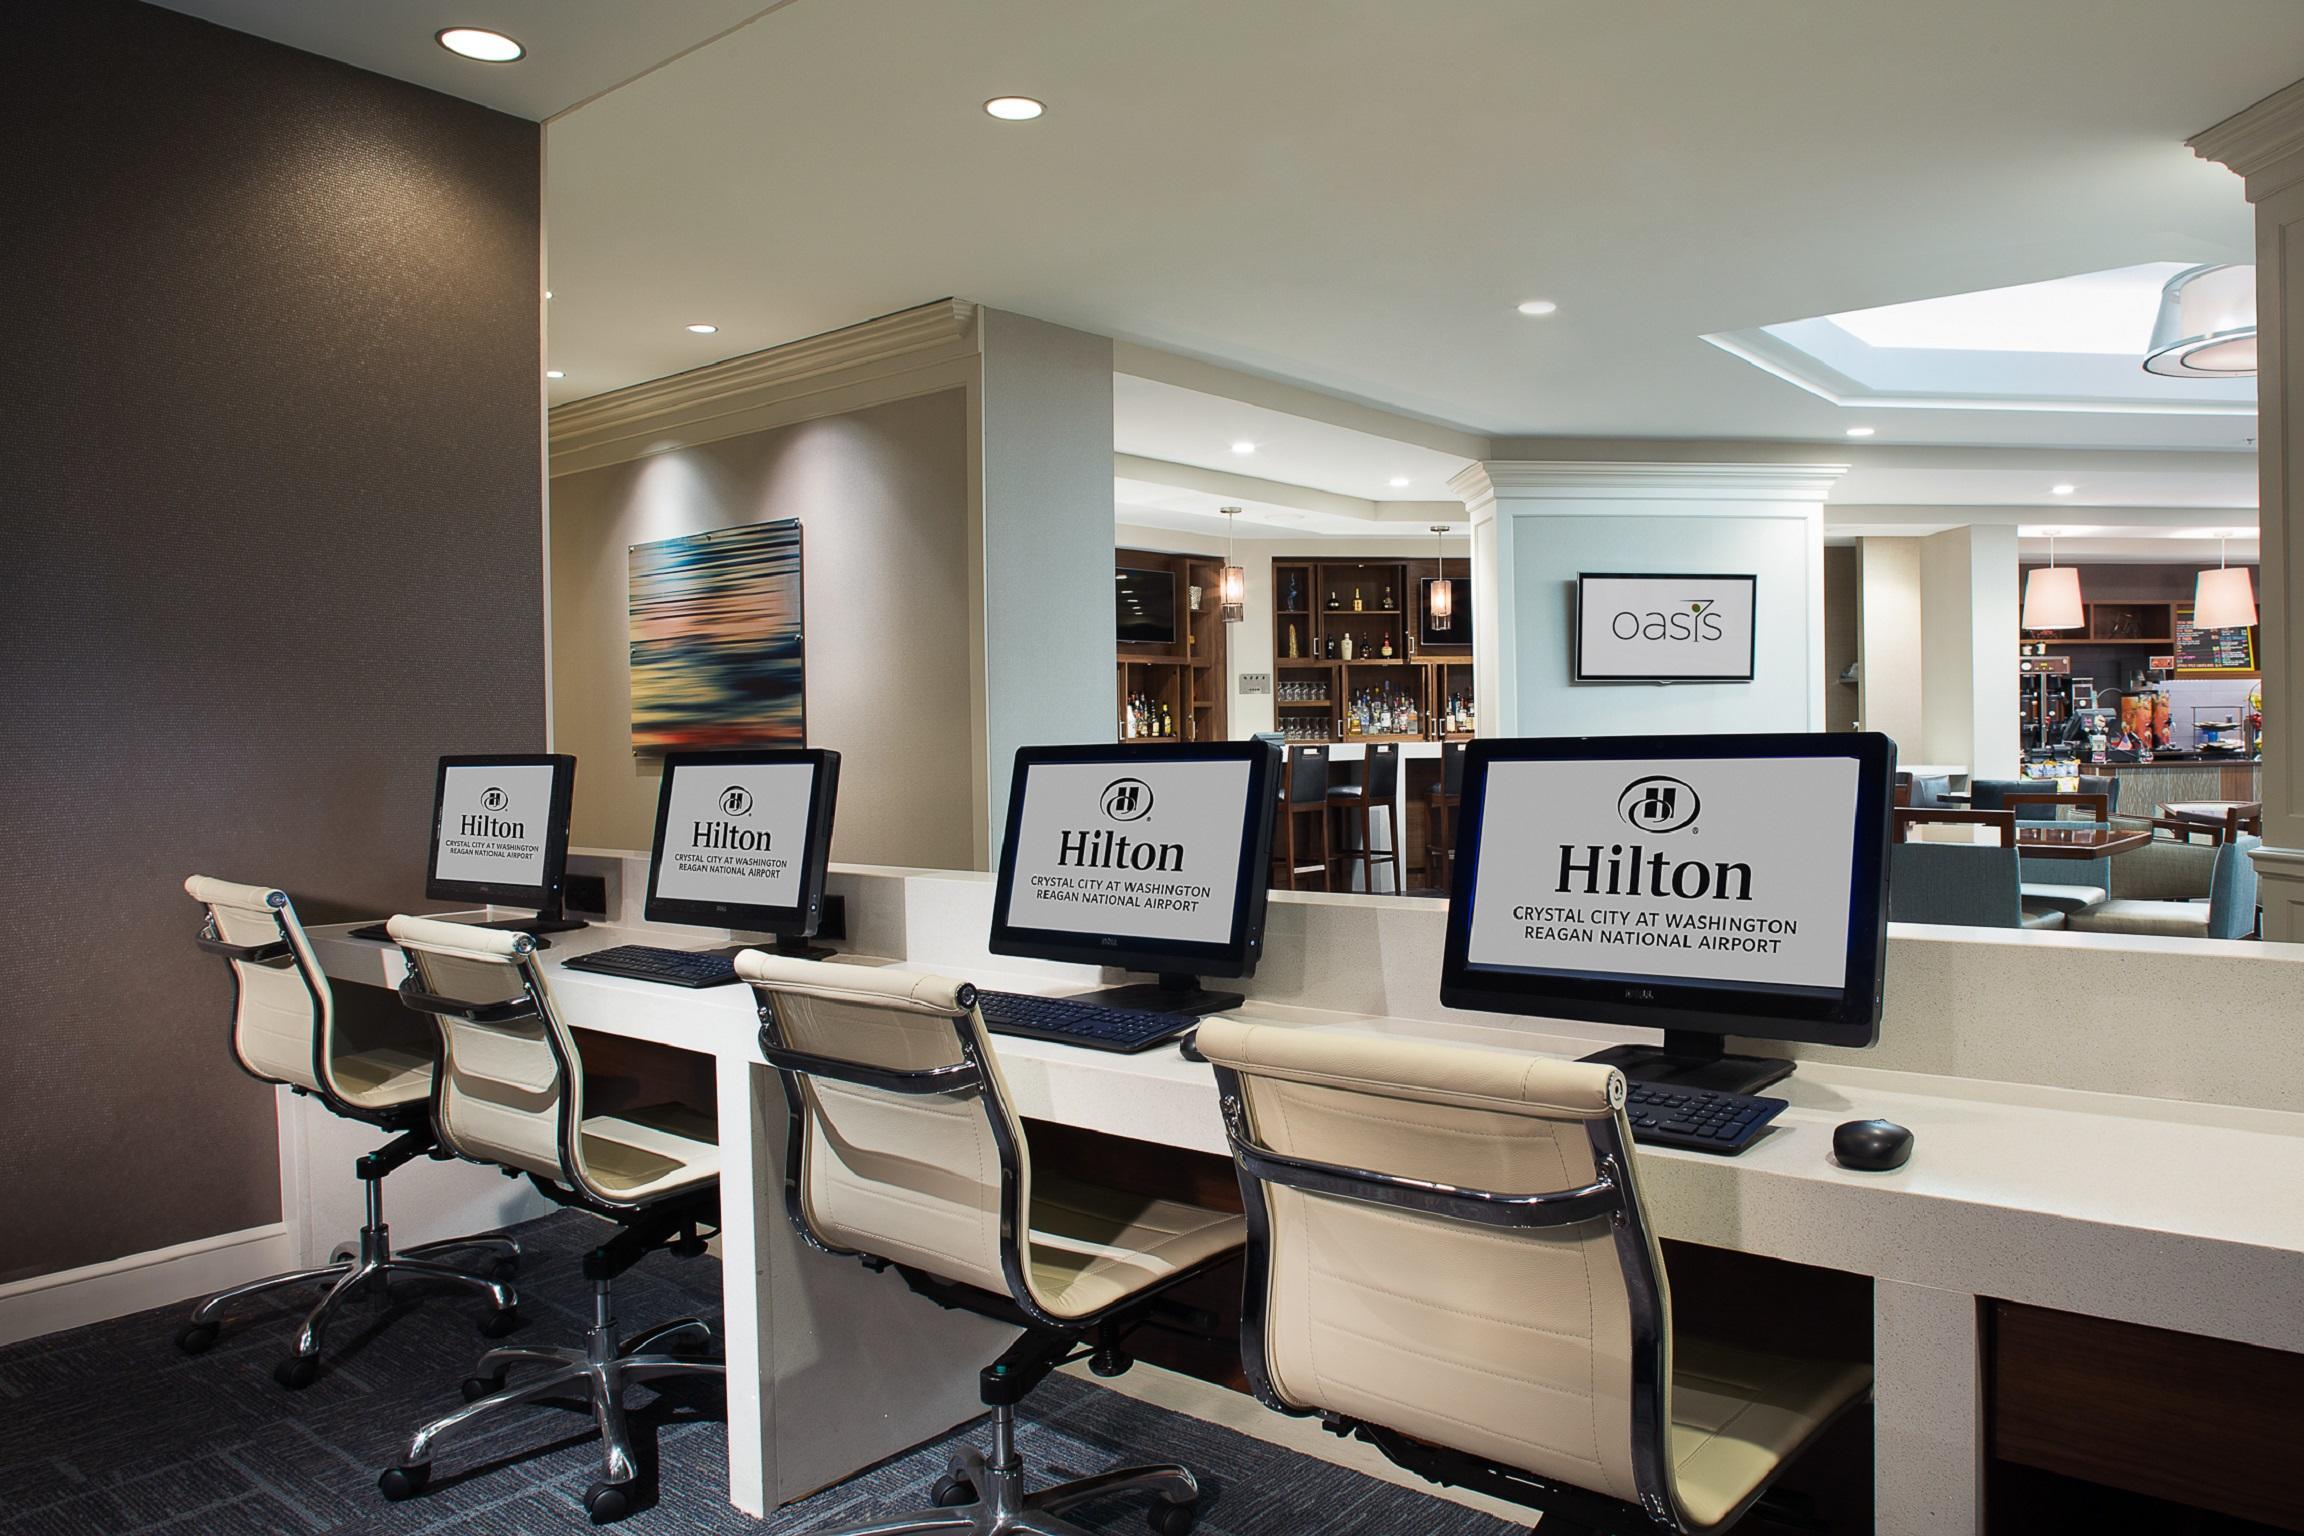 Hilton wifi coupon code